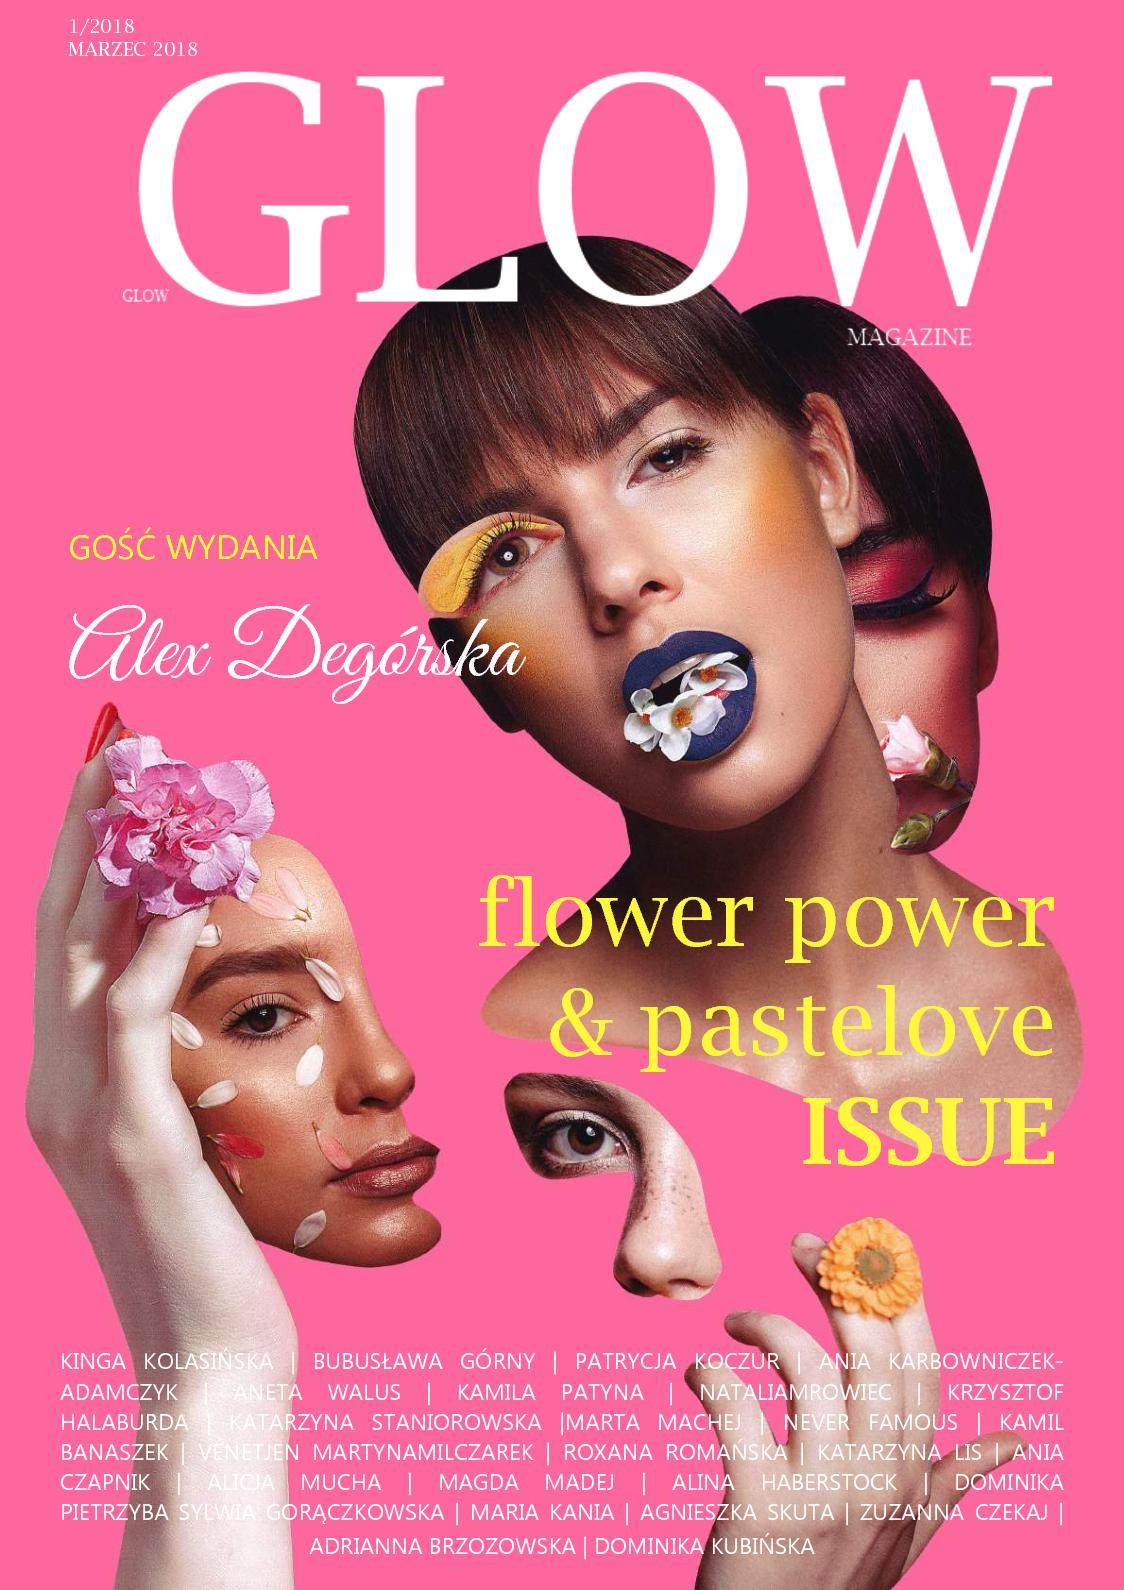 GLOW MAGAZINE ISSUE 4